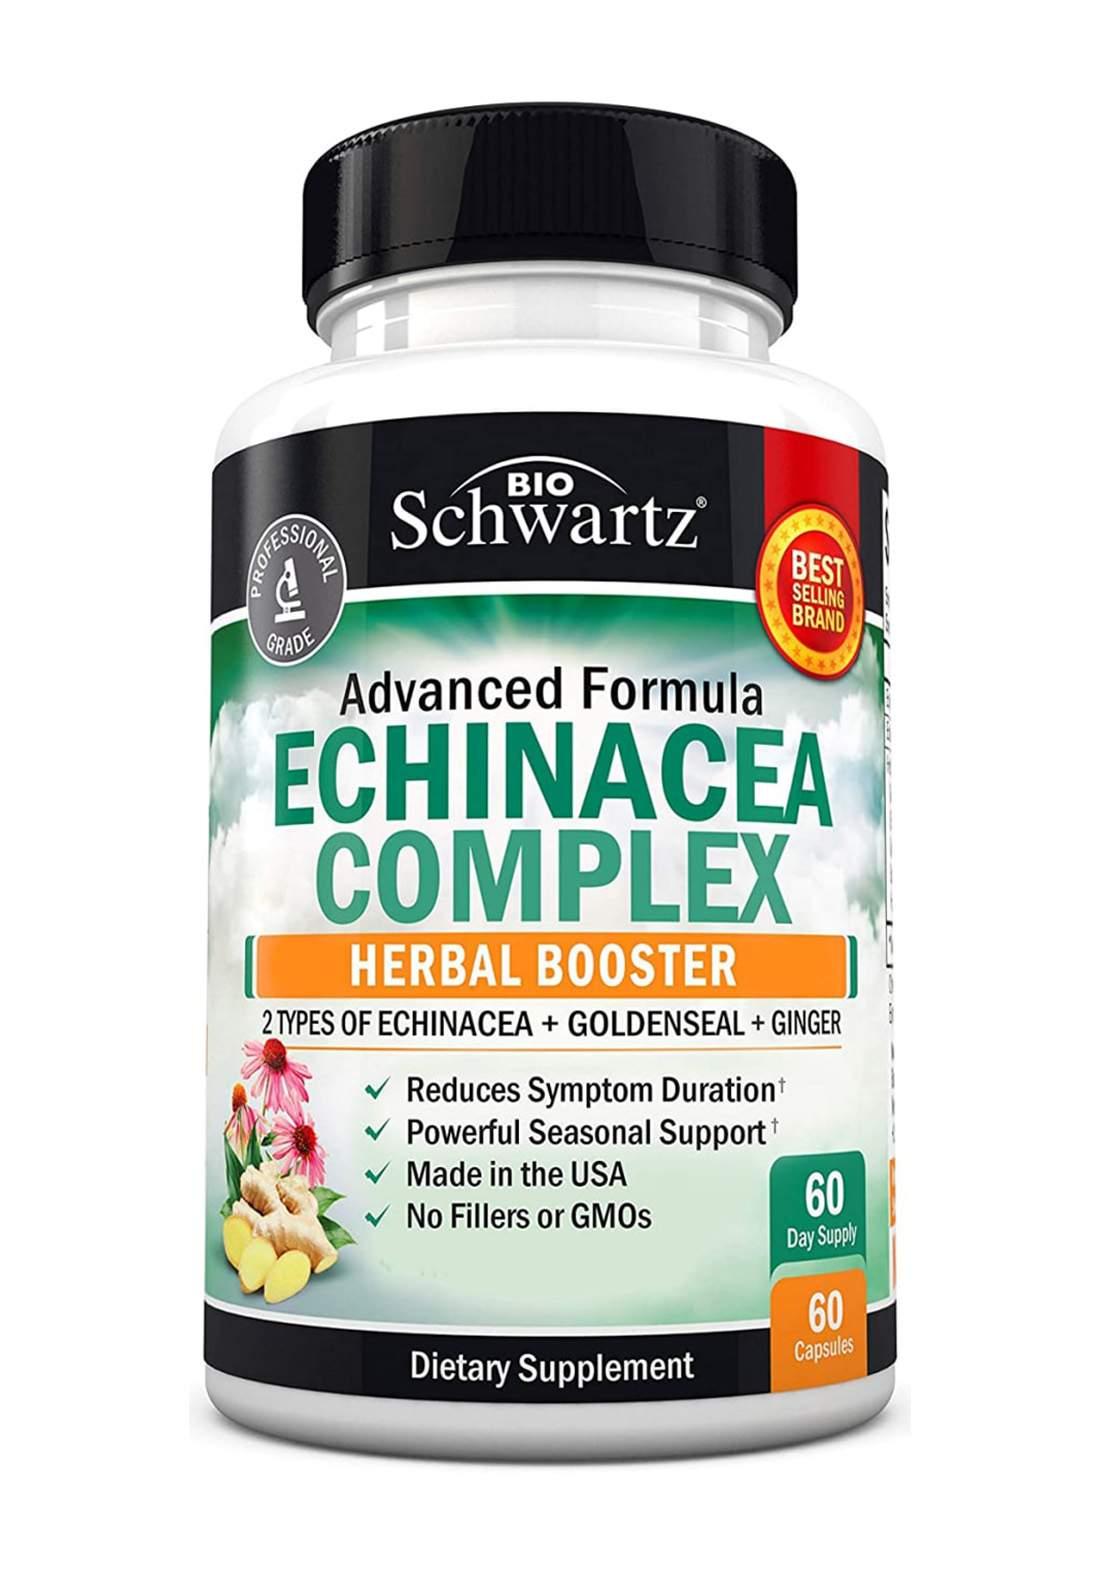 Bio Schwartz Advanced Formula Enchinacea Complex 60 Capsules  عشبة الاكنشيا المركب